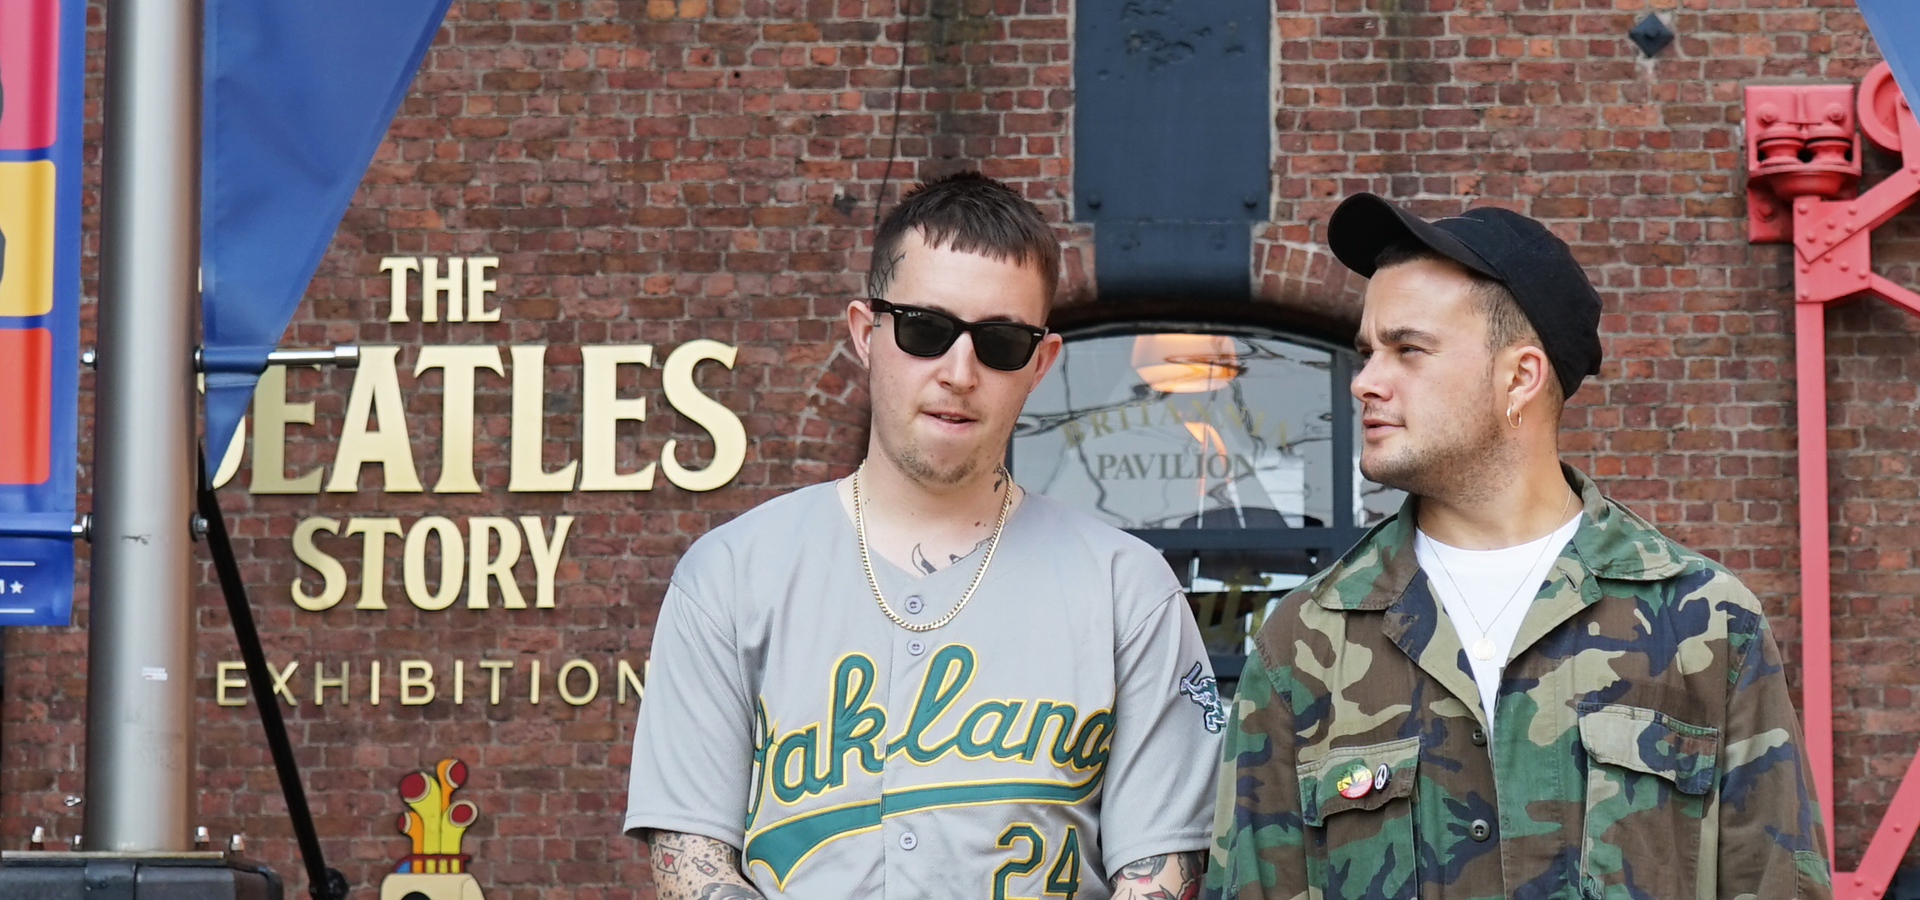 Slaves: Punk duo visit The Beatles Story